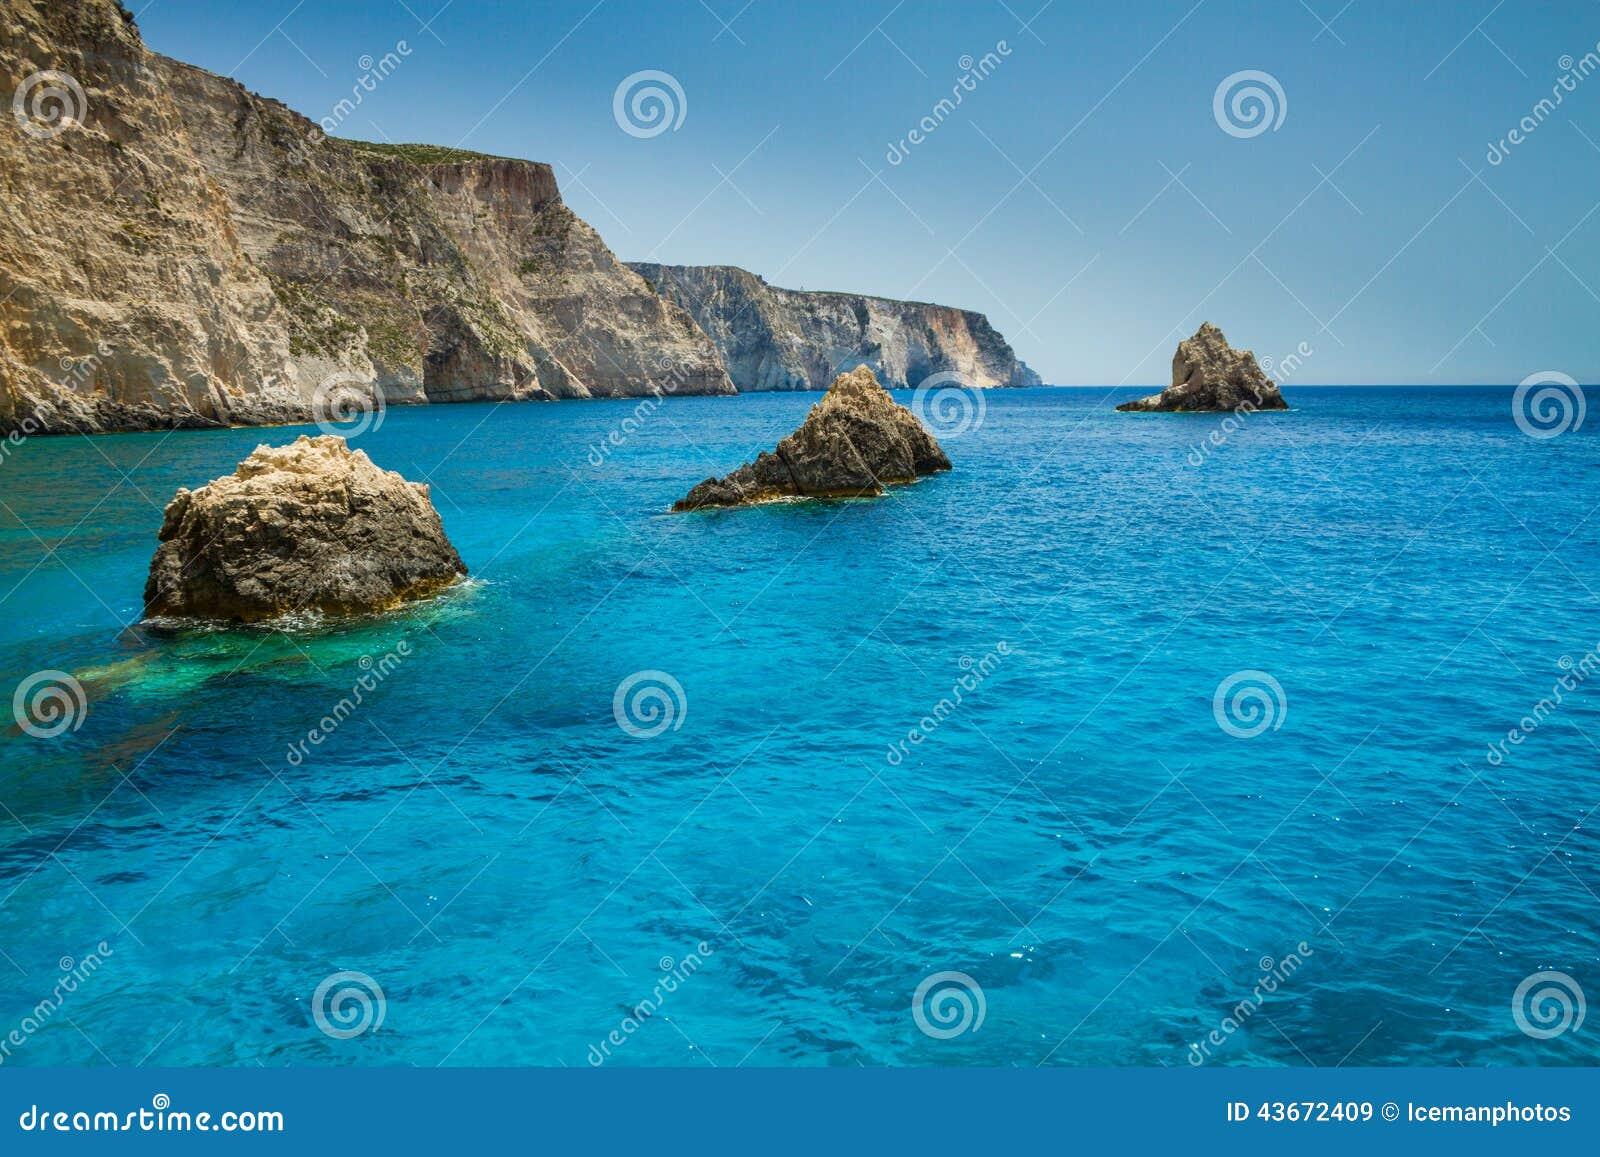 Famous blue caves view on Zakynthos island, Greece